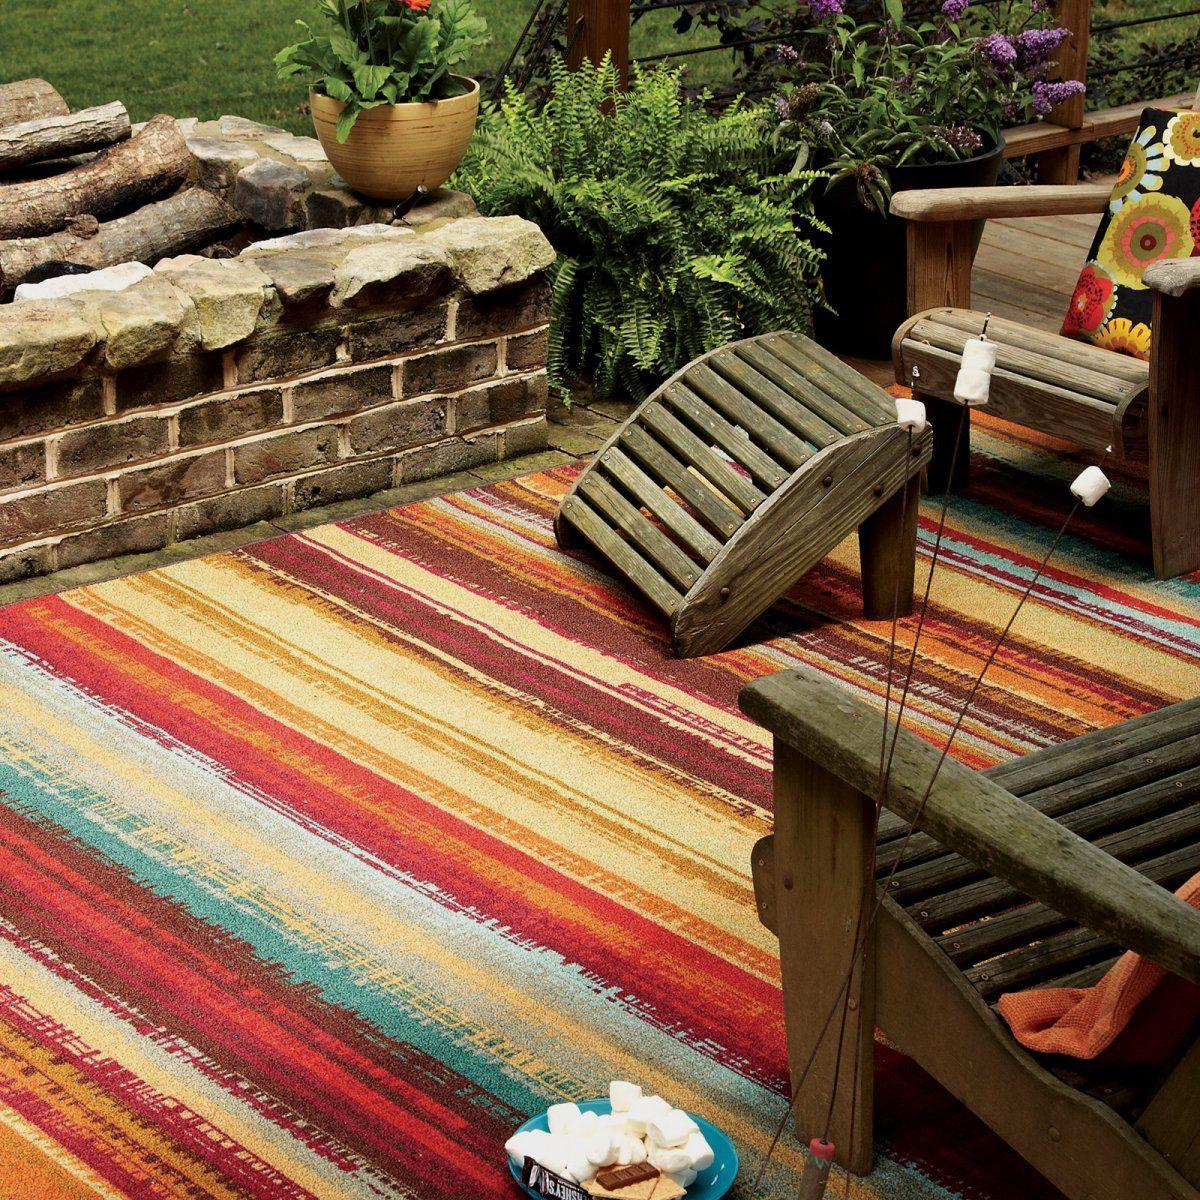 The Modern Design Of Outdoor Carpeting -excellent Decoration ideas., outdoor carpeting, outdoor carpeting by the yard, outdoor carpeting for decks, outdoor carpeting for porches, outdoor carpeting home depot  http://singingweb.com/116603/modern-design-outdoor-carpeting